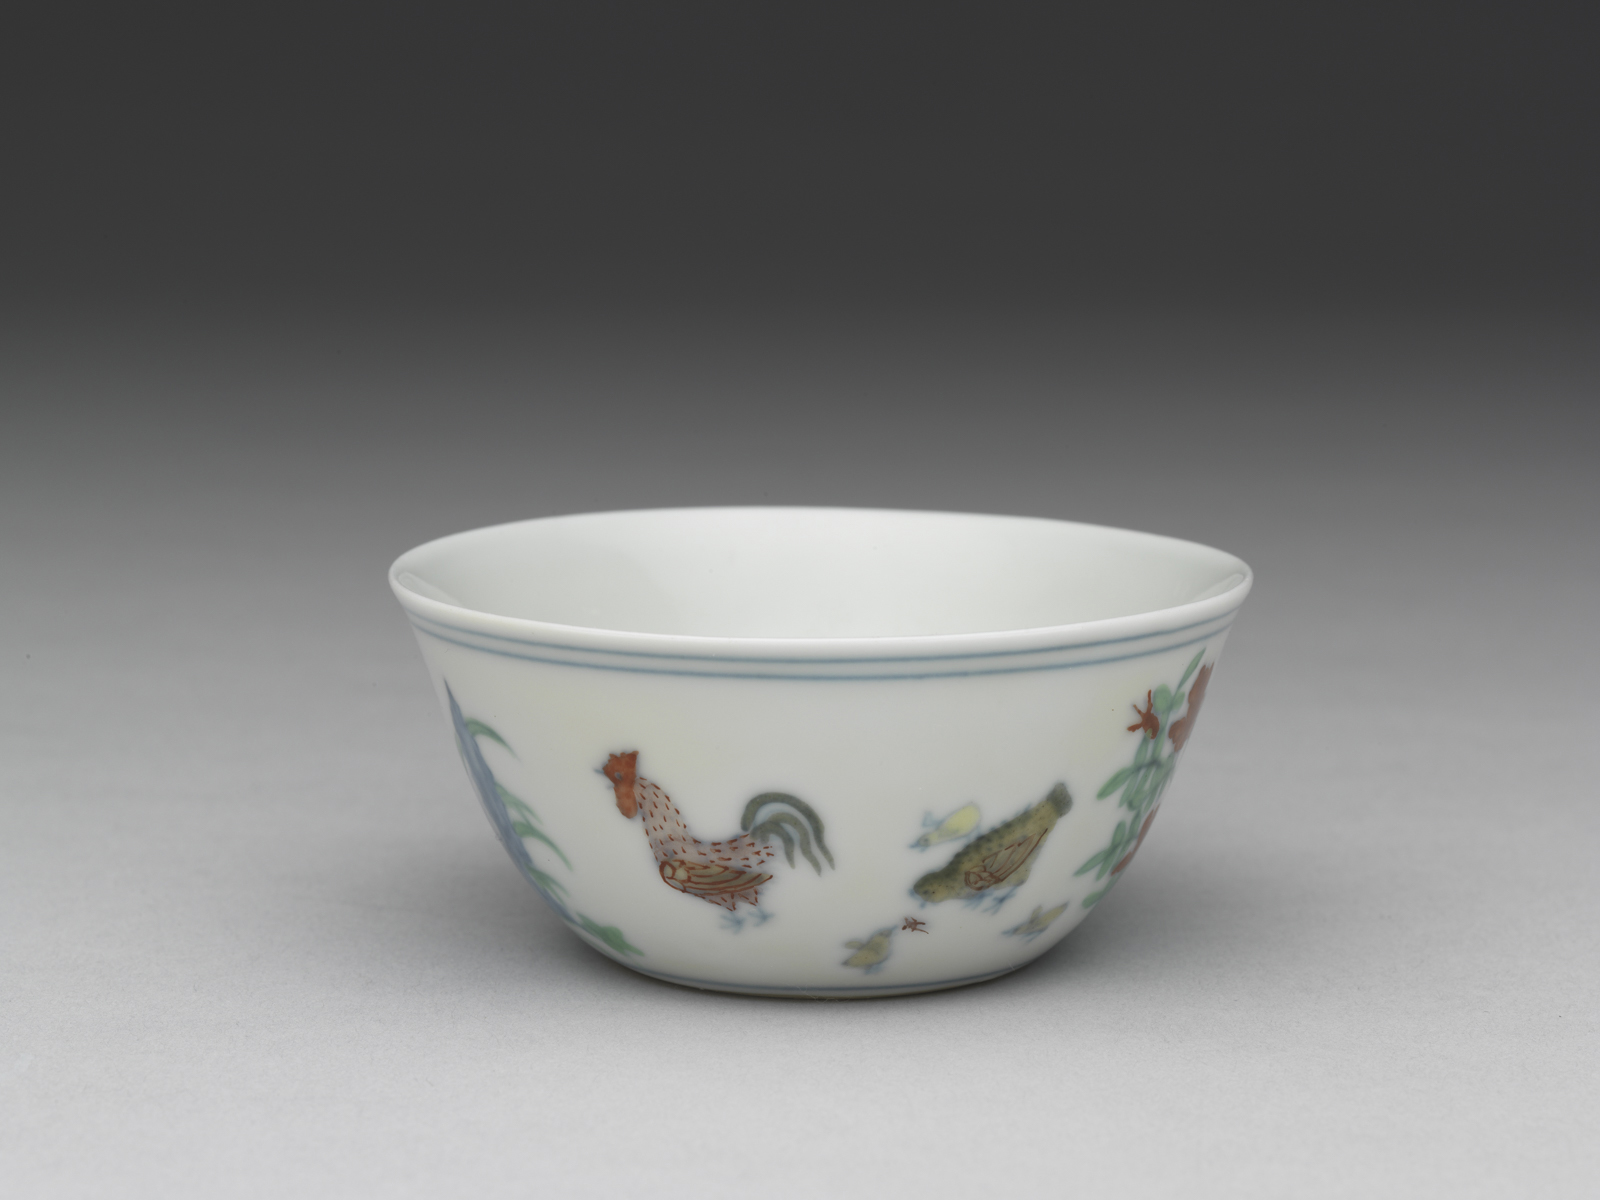 AAM Emperors' Treasures Cup with chicken design EX2016.3.91_01